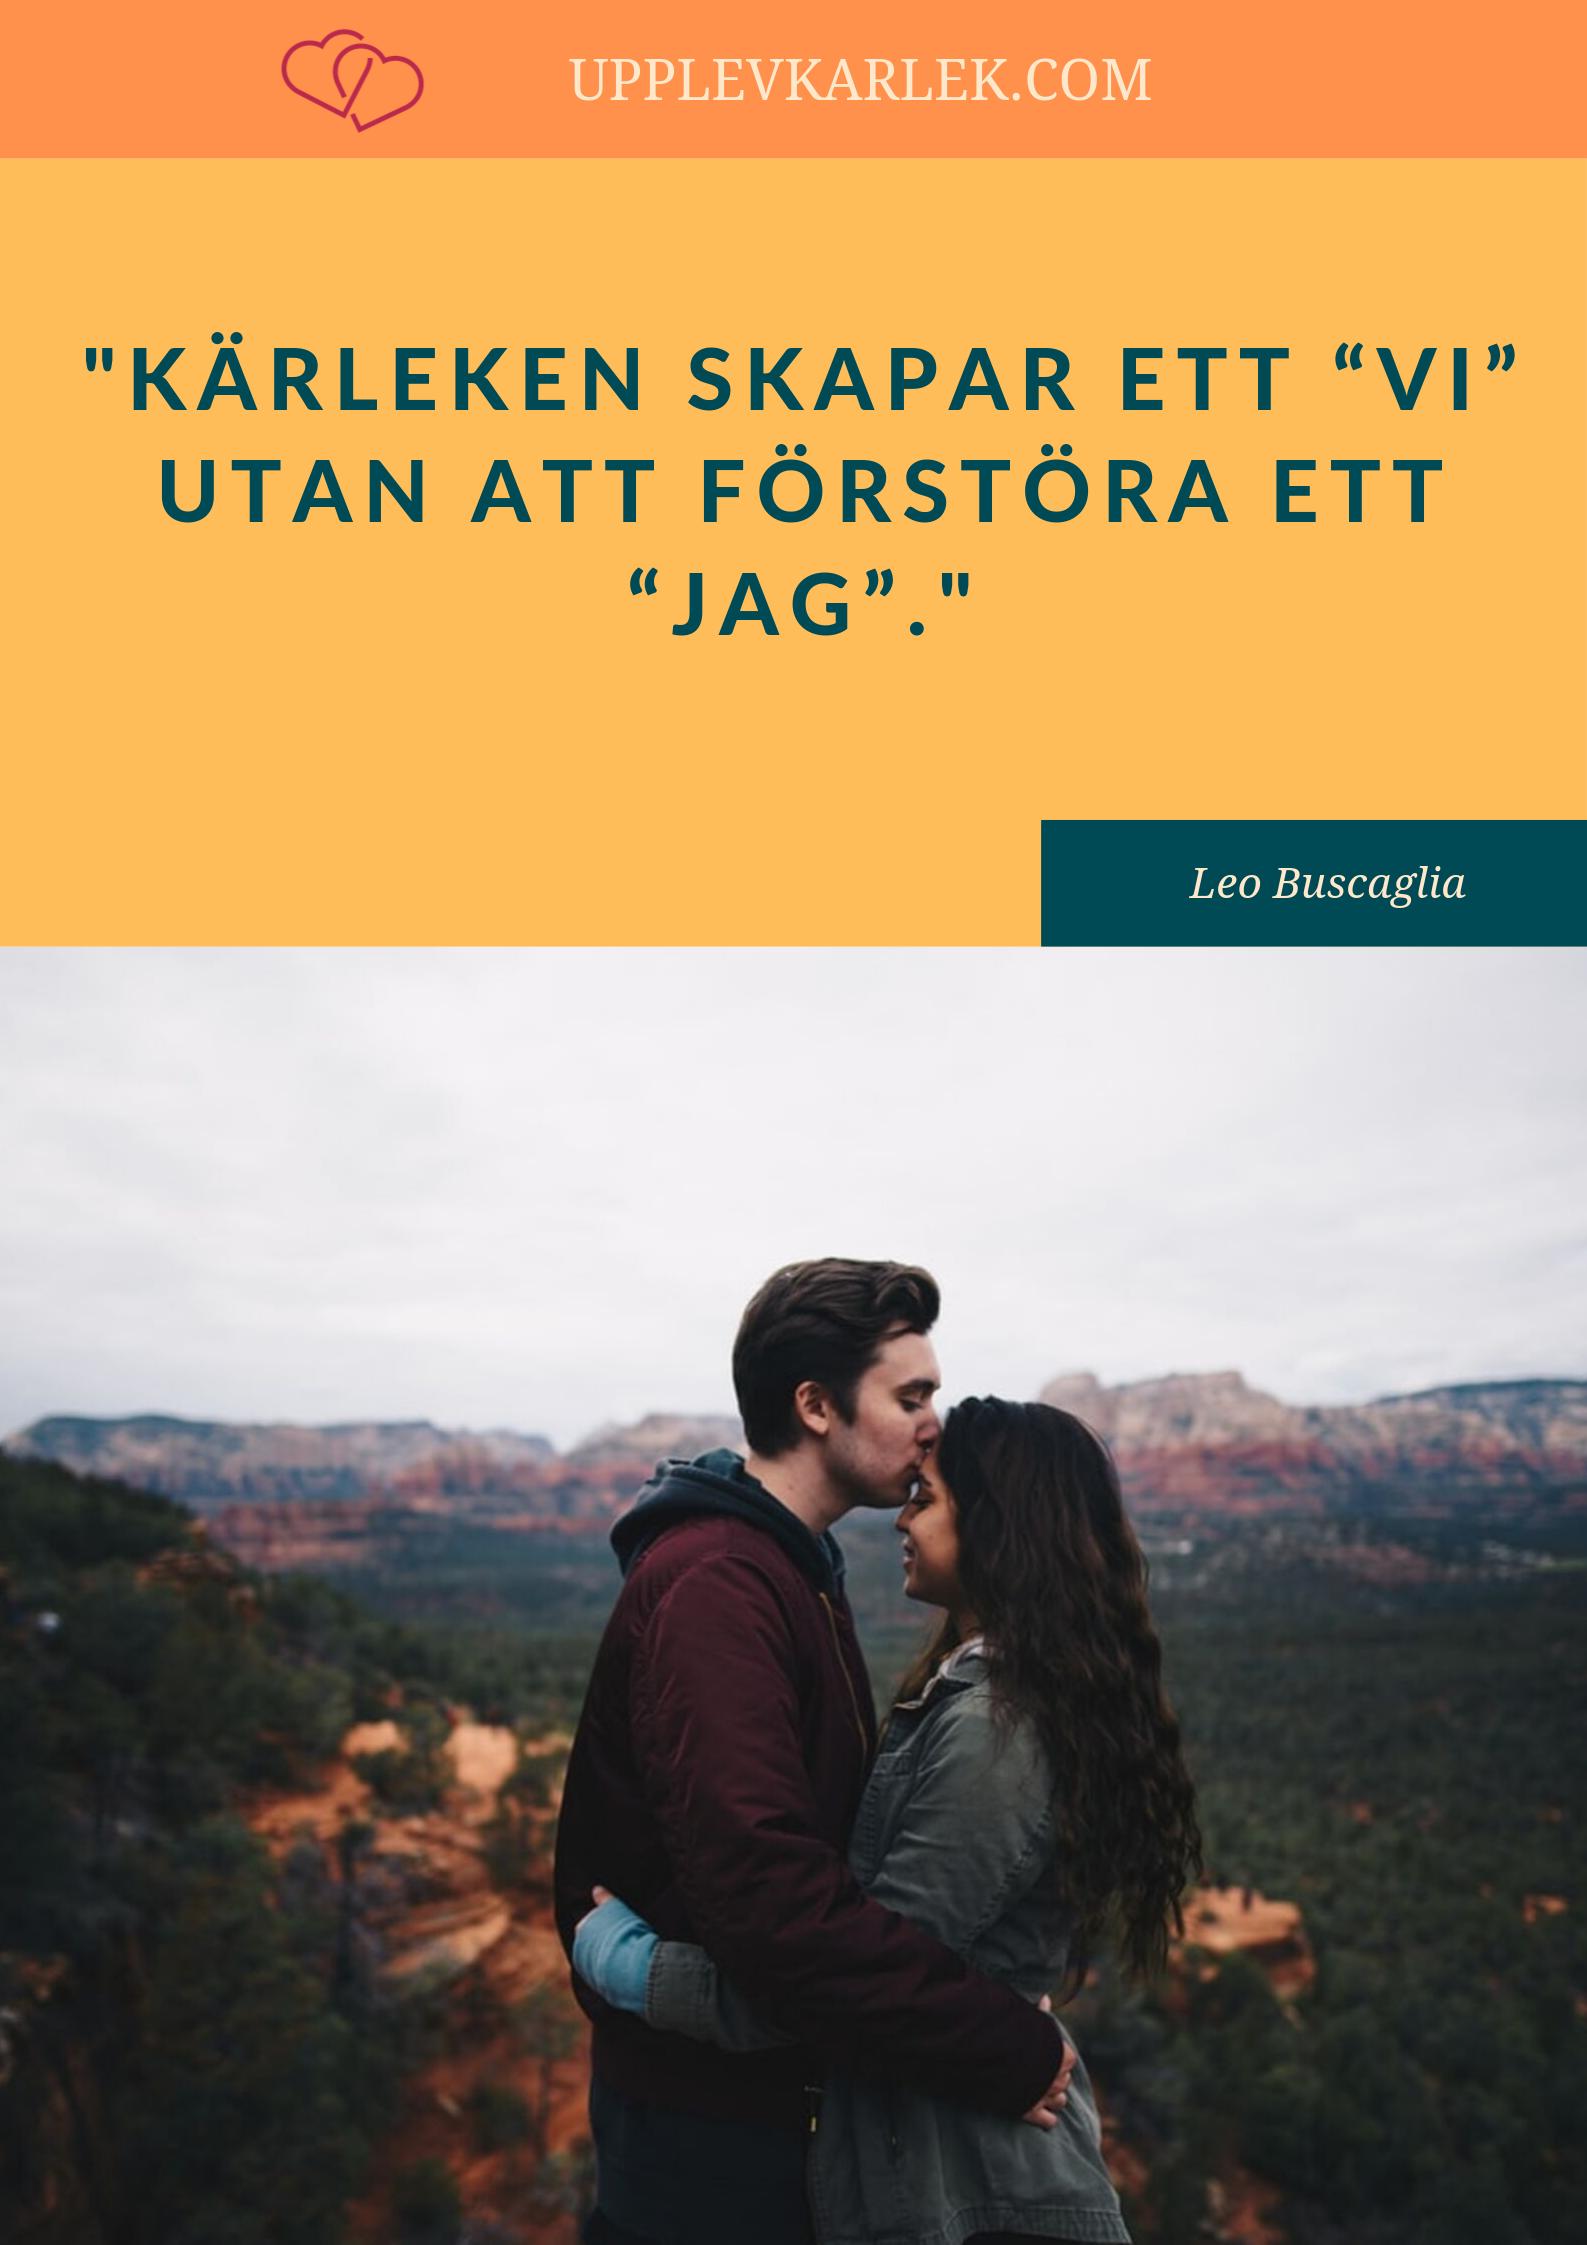 114 Karlek Citat Pa Svenska Karlekscitat Citat Citat Om Lycka Karlek